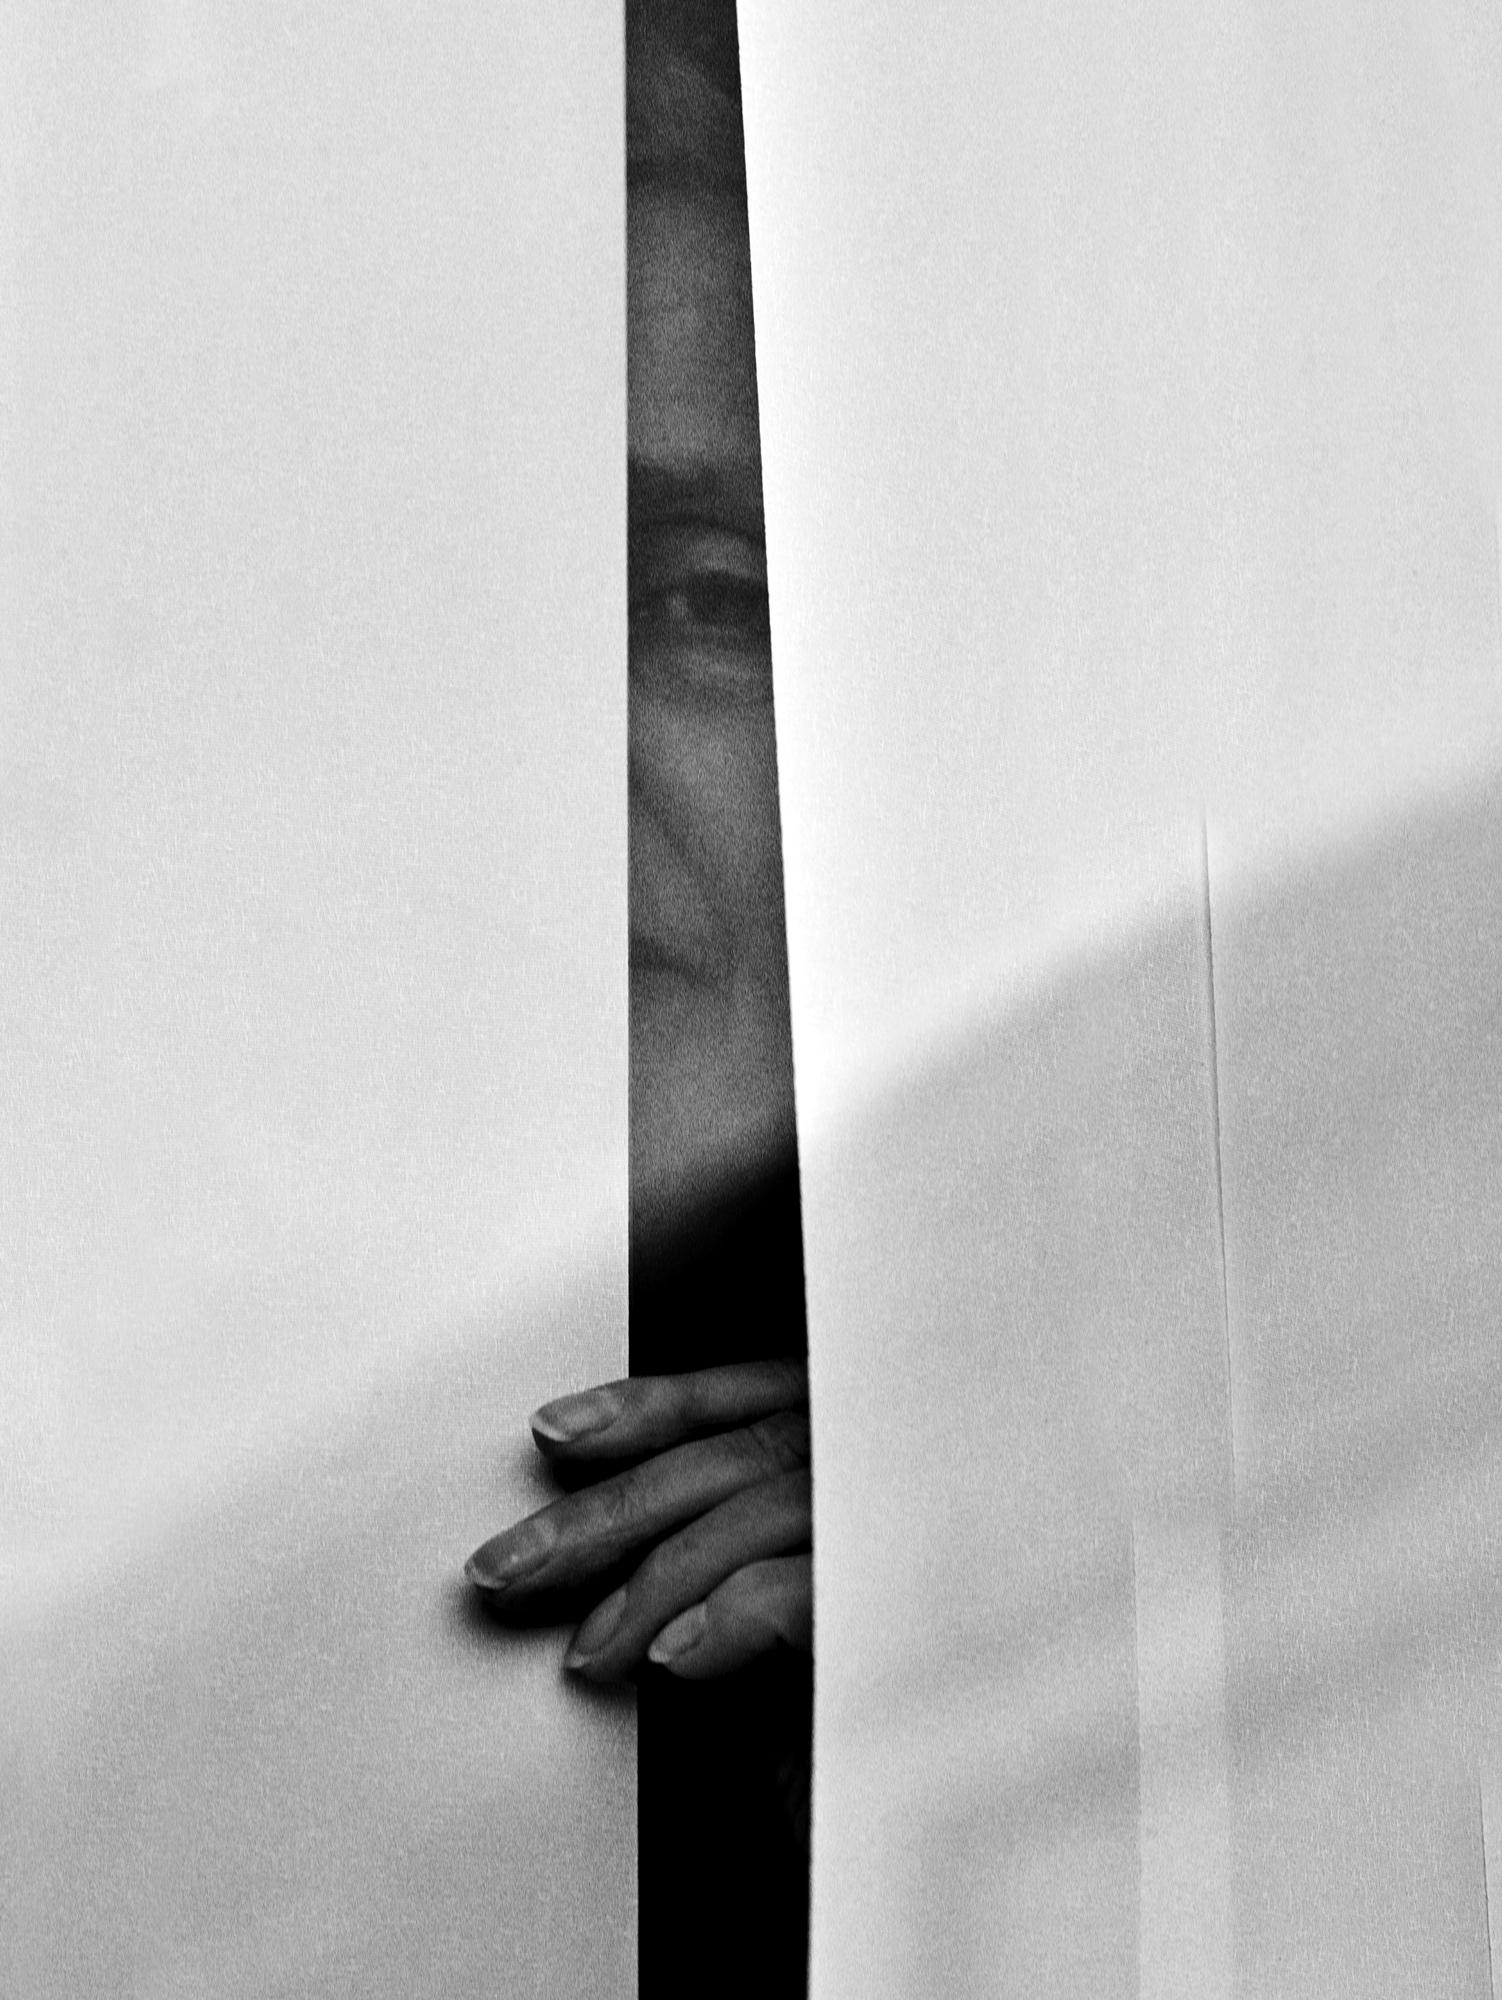 Peering through the blinds, mum, 2020 By Ioannis Koussertari.